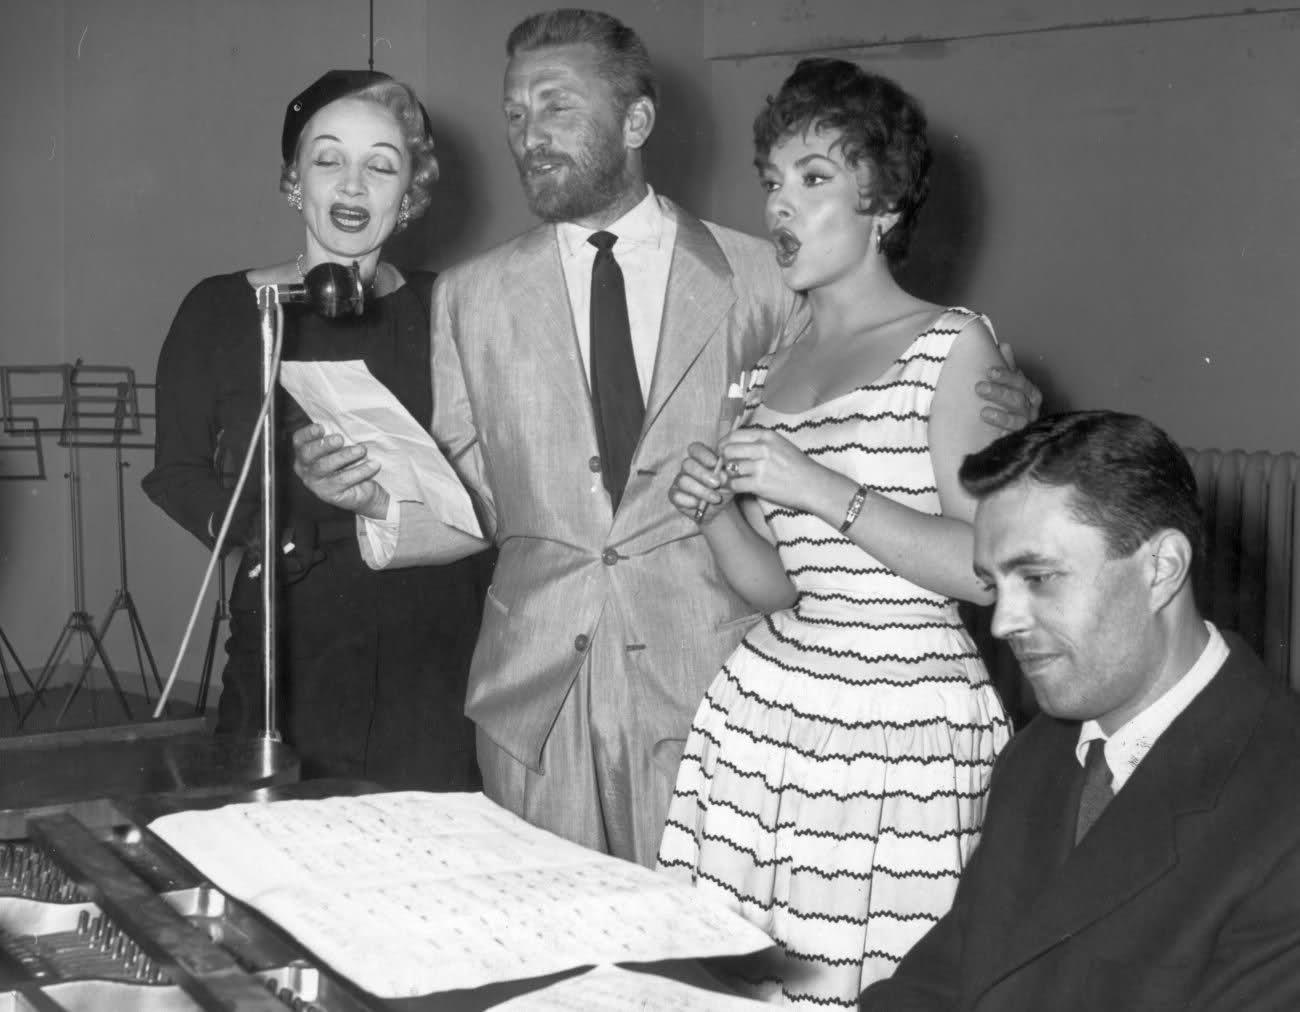 Marlene Dietrich, Kirk Douglas and Gina Lollobrigida at benefit's concert, Paris, 1955